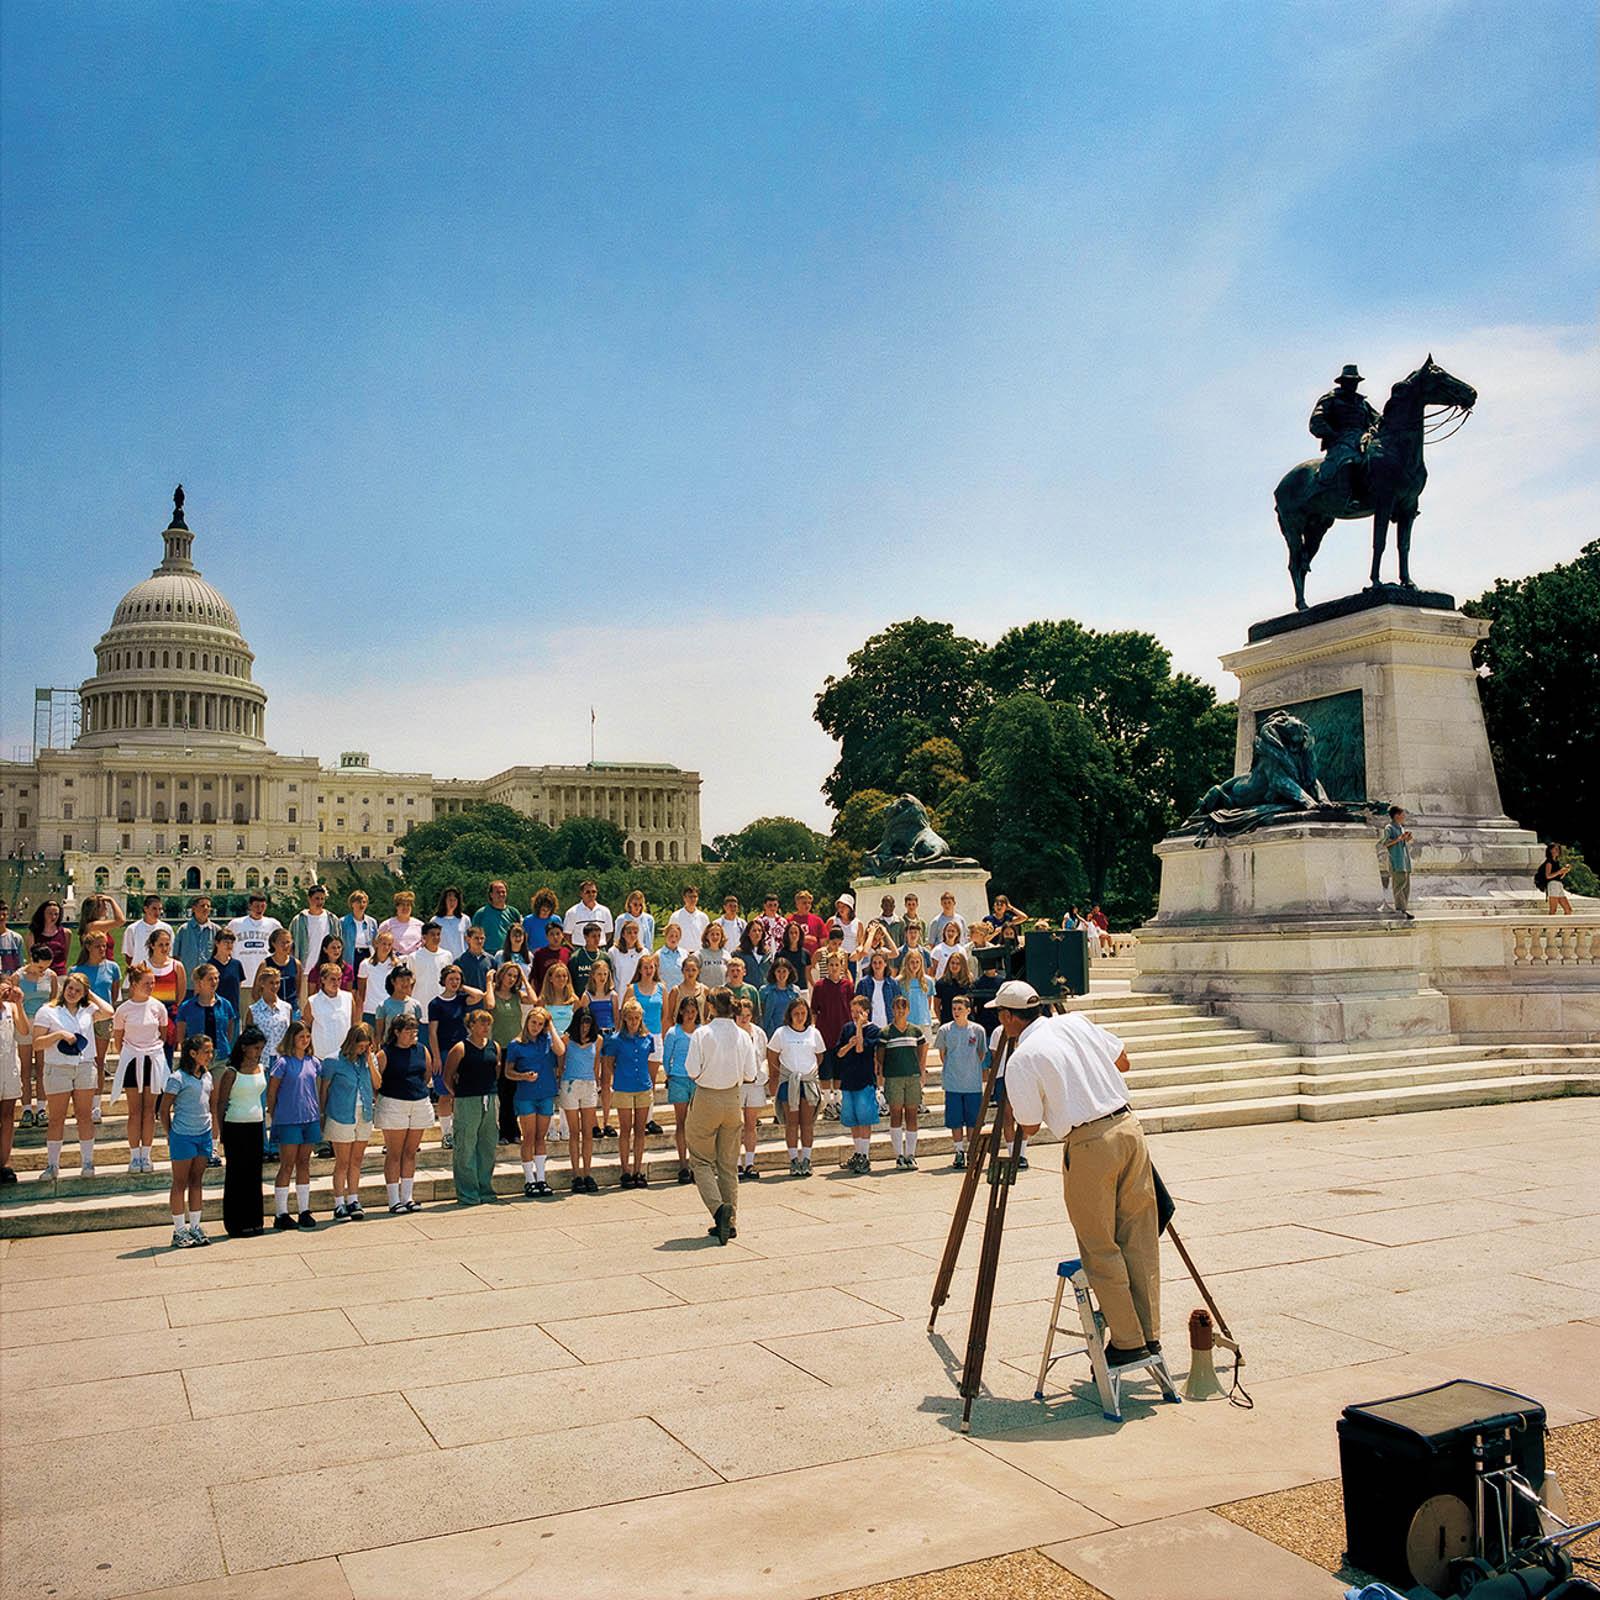 Group Photograph at United States Capitol, Washington, DC 2000